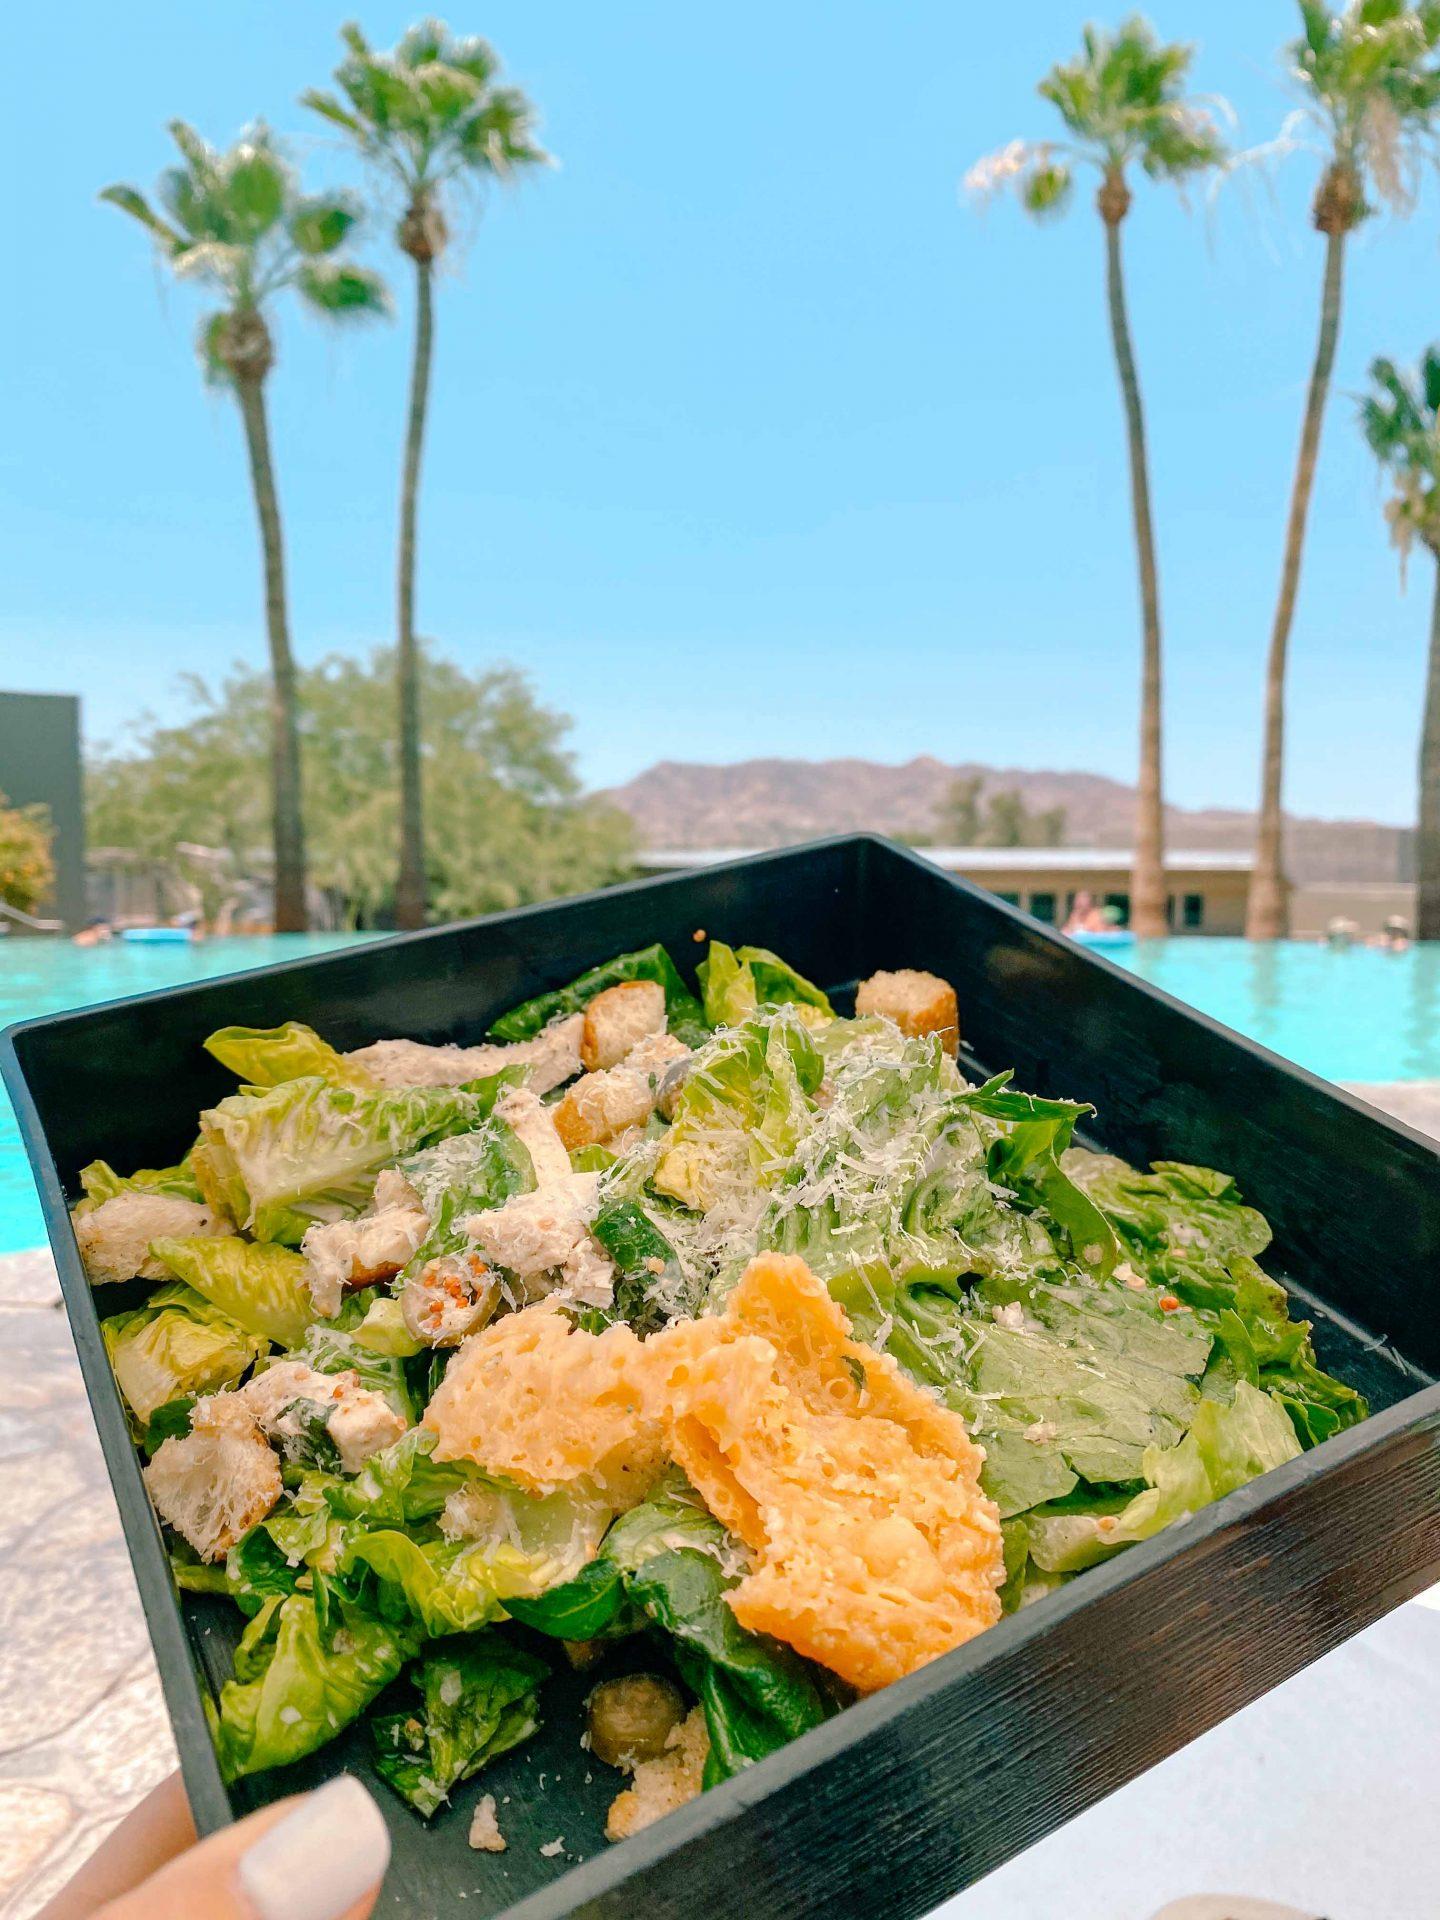 pool day, spa day, sanctuary resort scottsdale Arizona, French fries, Caesar salad, spa, massage, tea, treat yourself, relax, honeymoon, ultimate guide to scottsdale Arizona, summer guide